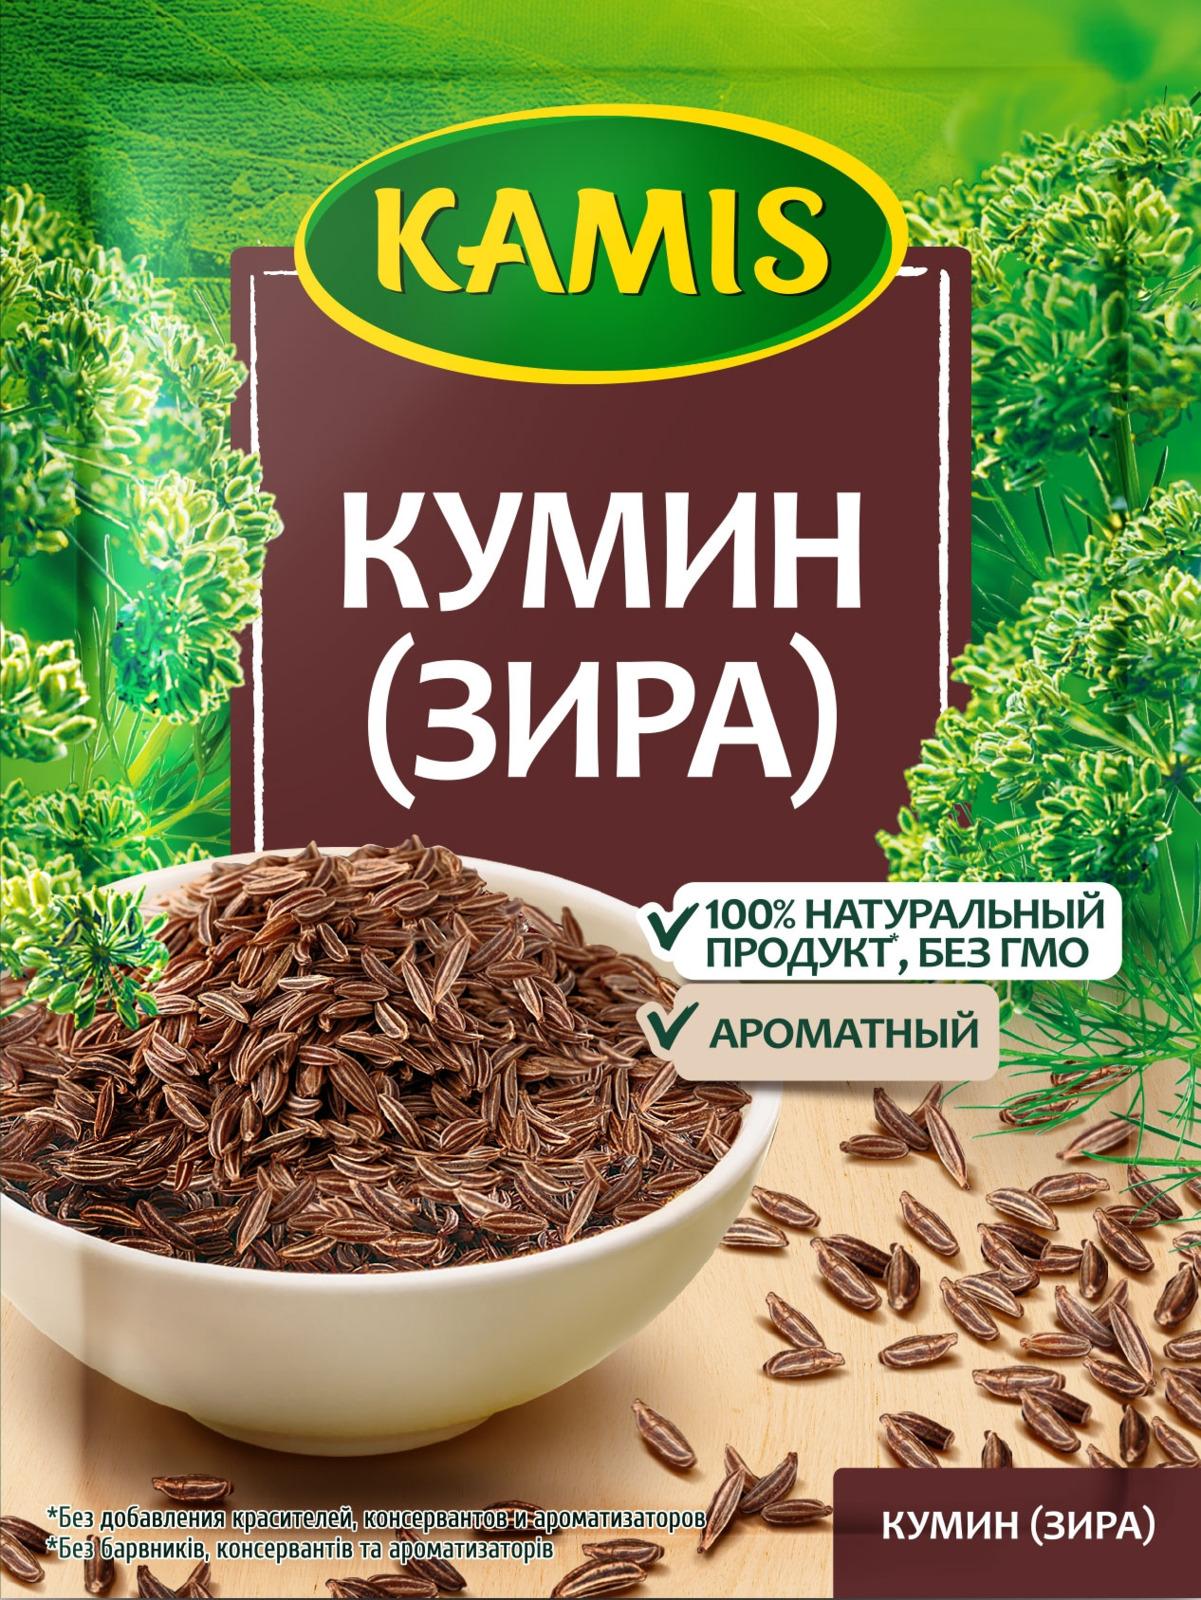 цены на Kamis кумин (зира), 15 г  в интернет-магазинах